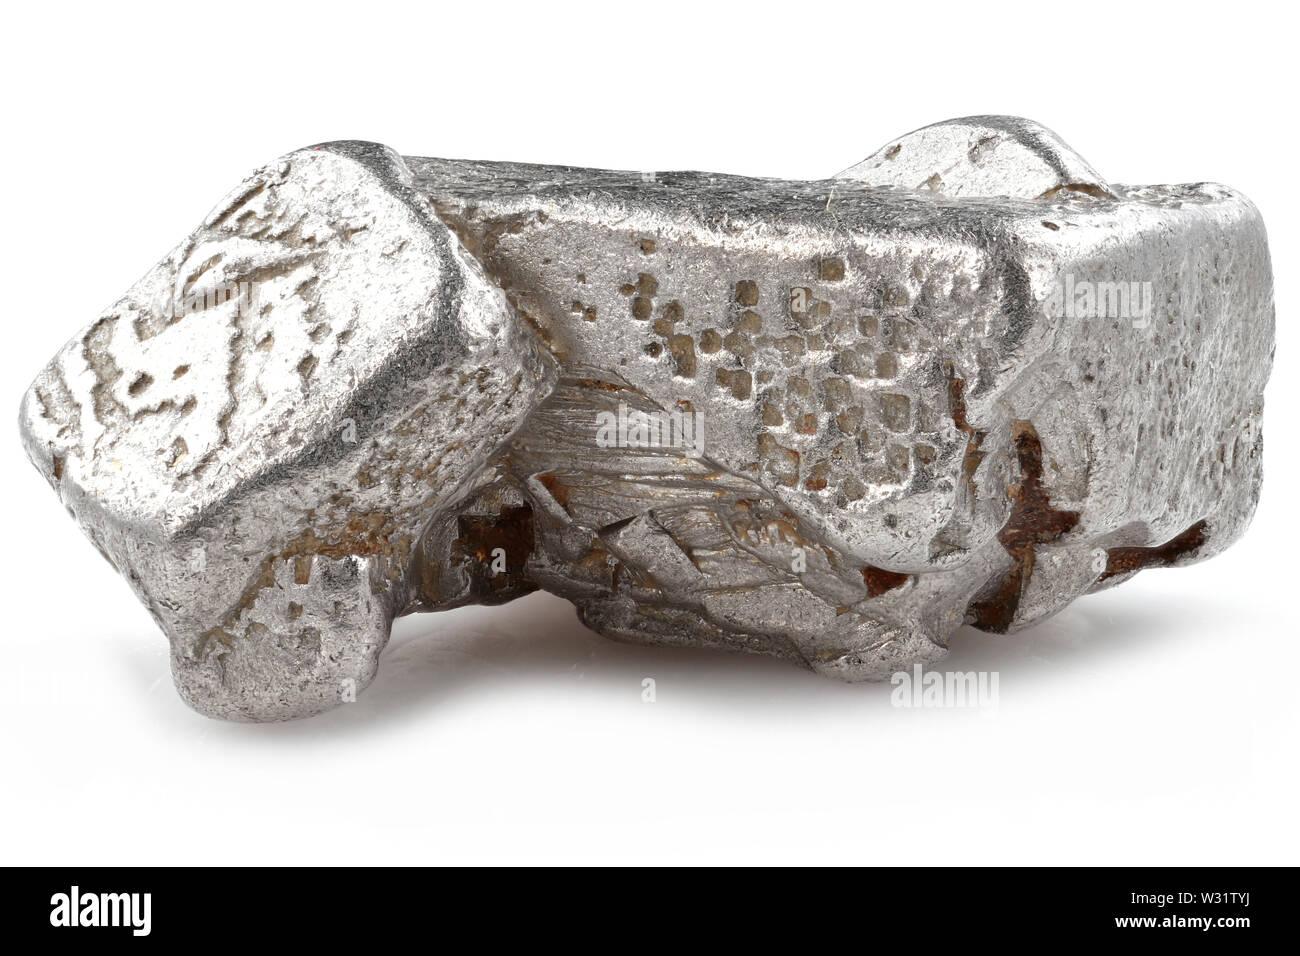 native 2.5 gram platinum nugget from the Kondyor Massif, Khabarovsk Krai, Russia isolated on white background - Stock Image